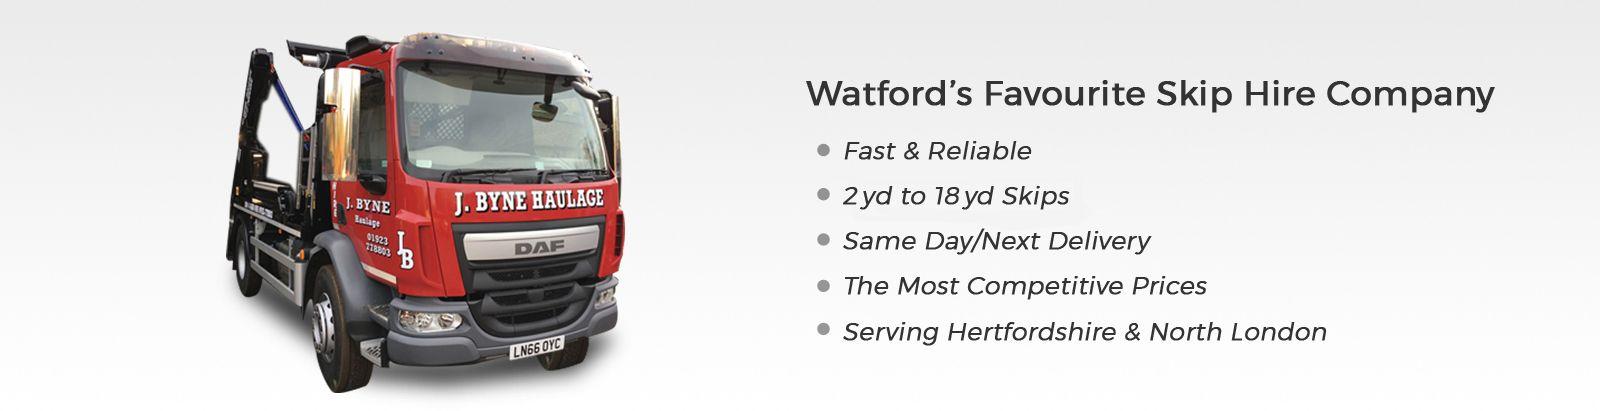 Skip Hire Watford J Byne Haulage Ltd Is A Registered Waste